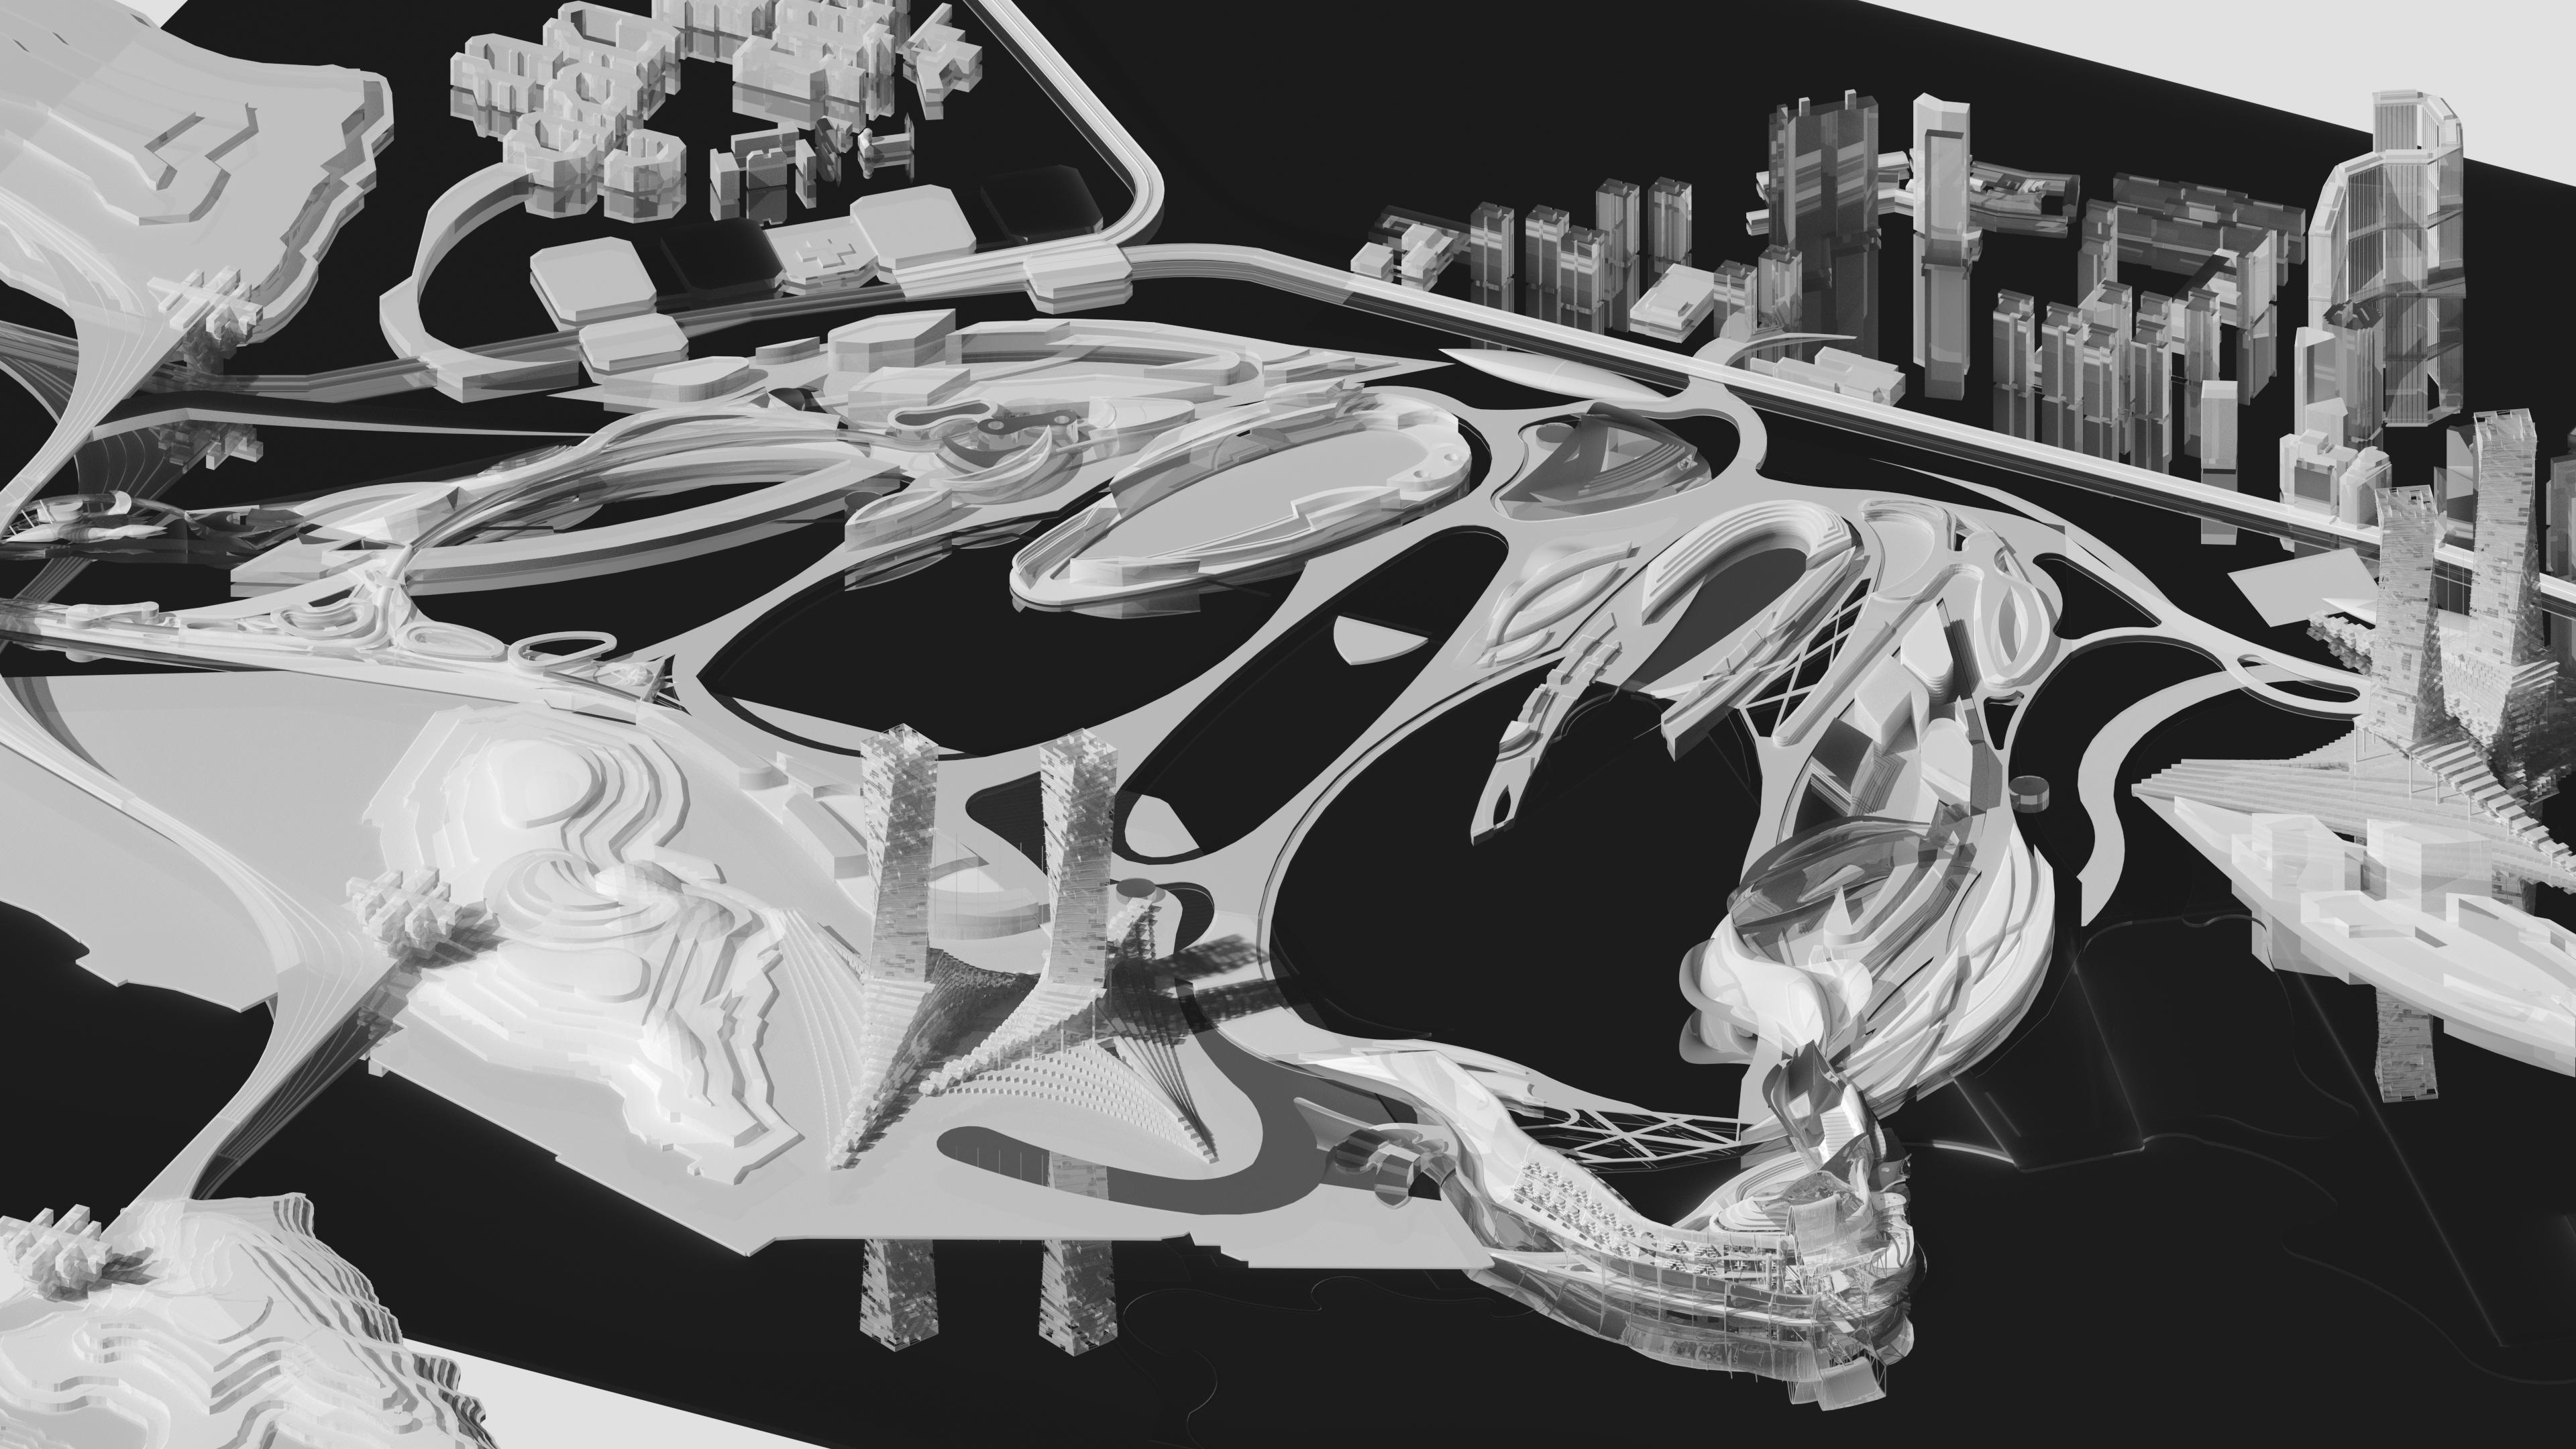 Mobili[city] Masterplan